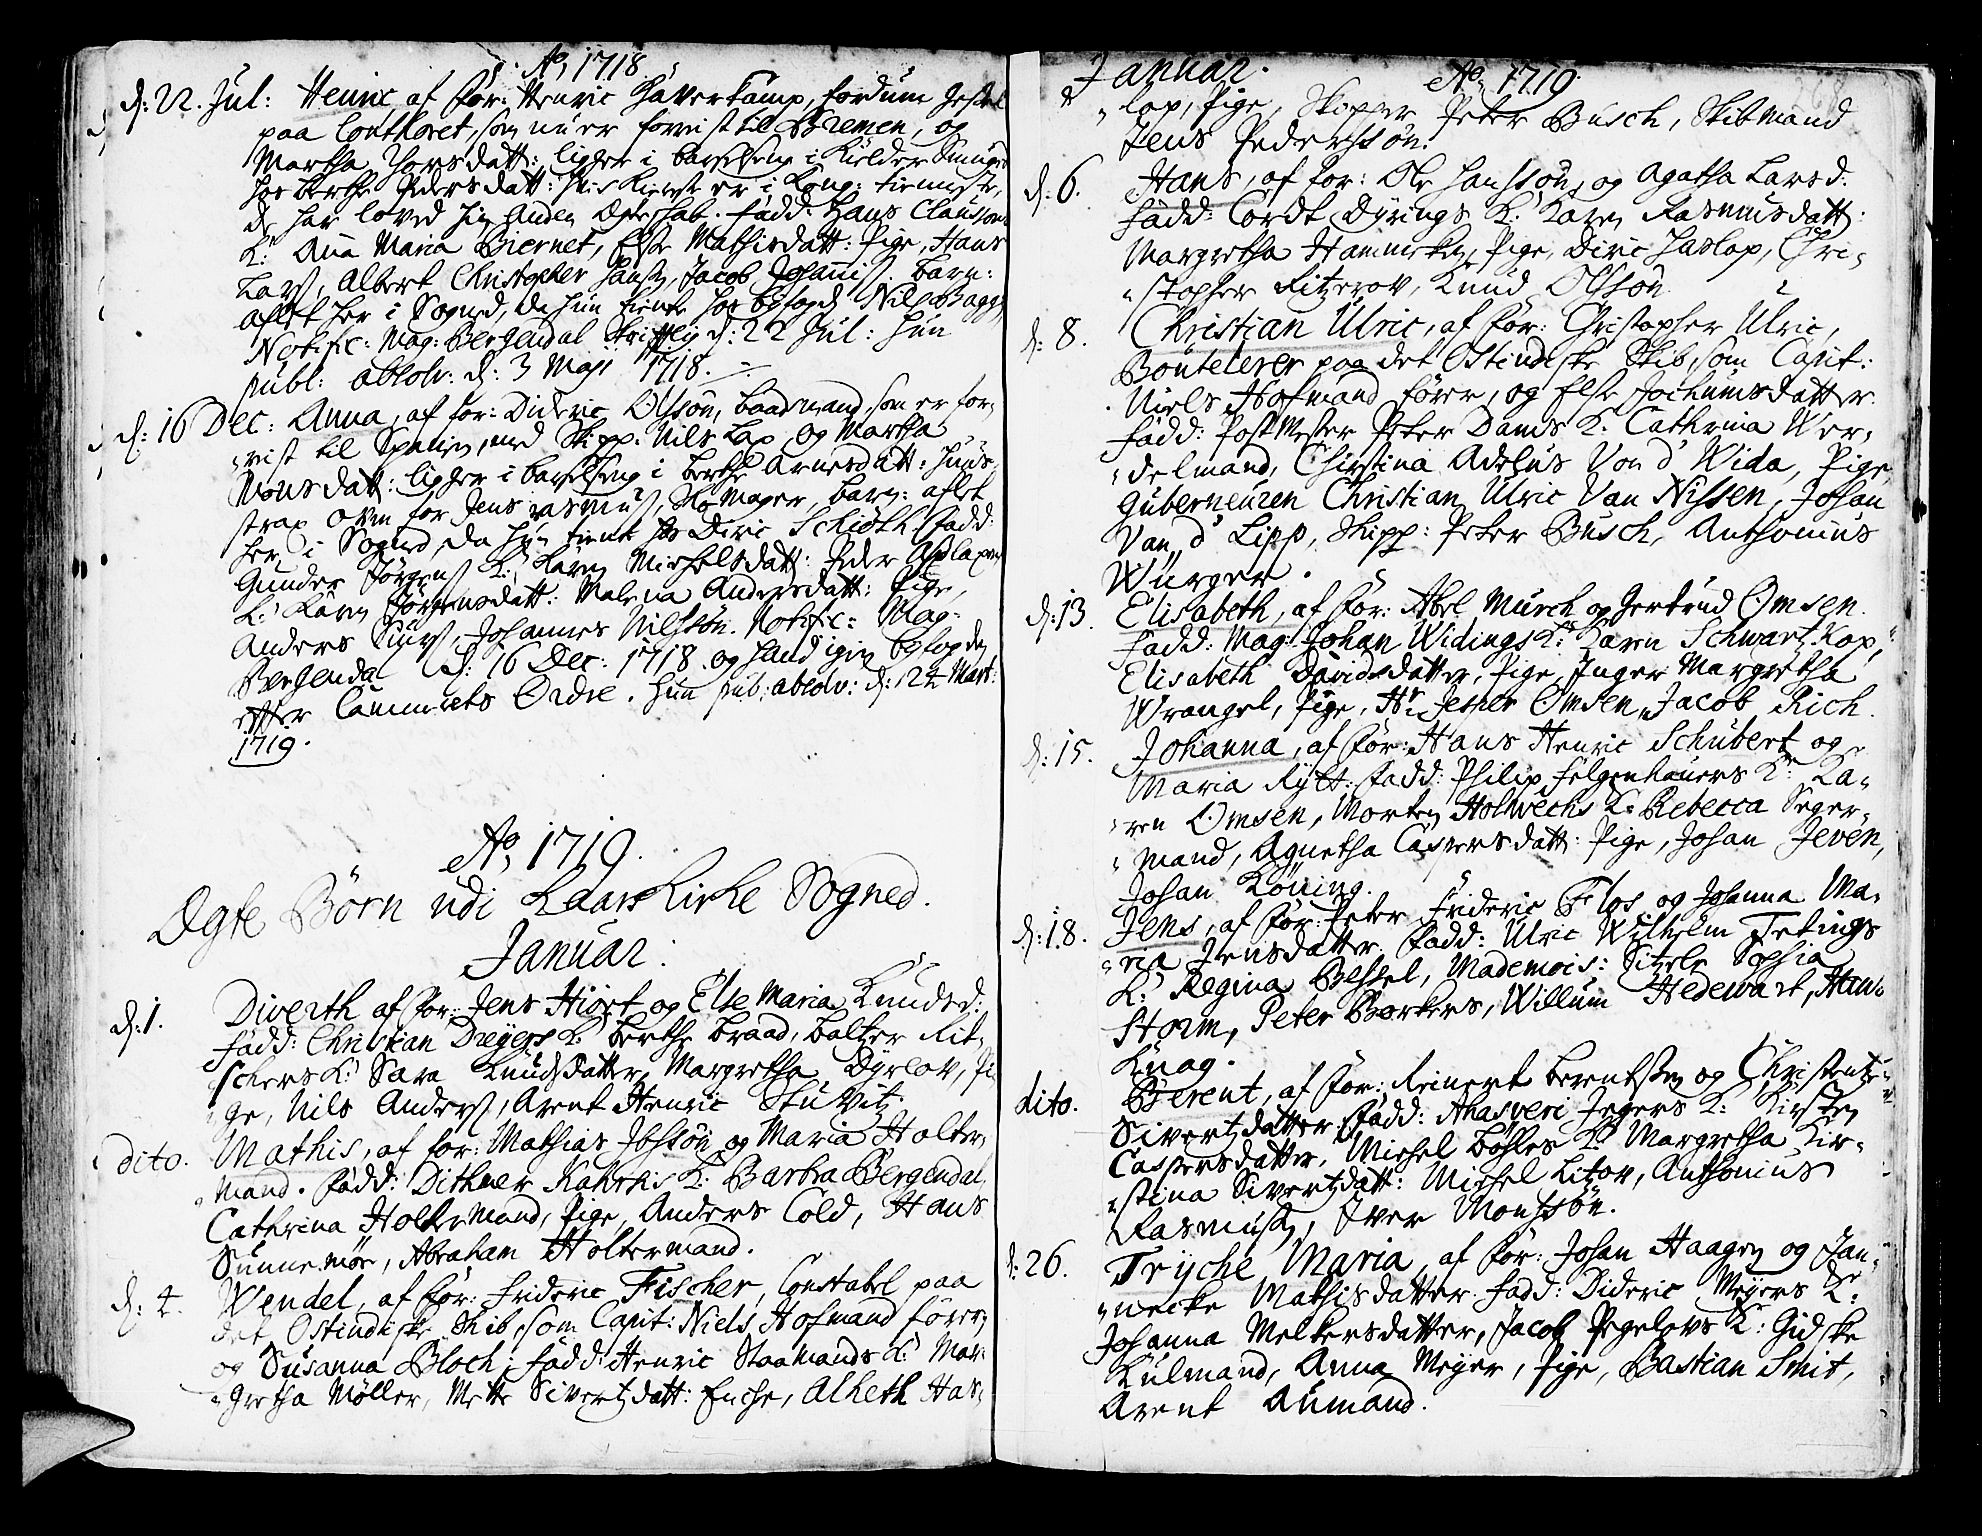 SAB, Korskirken Sokneprestembete, H/Haa/L0003: Ministerialbok nr. A 3, 1698-1719, s. 268